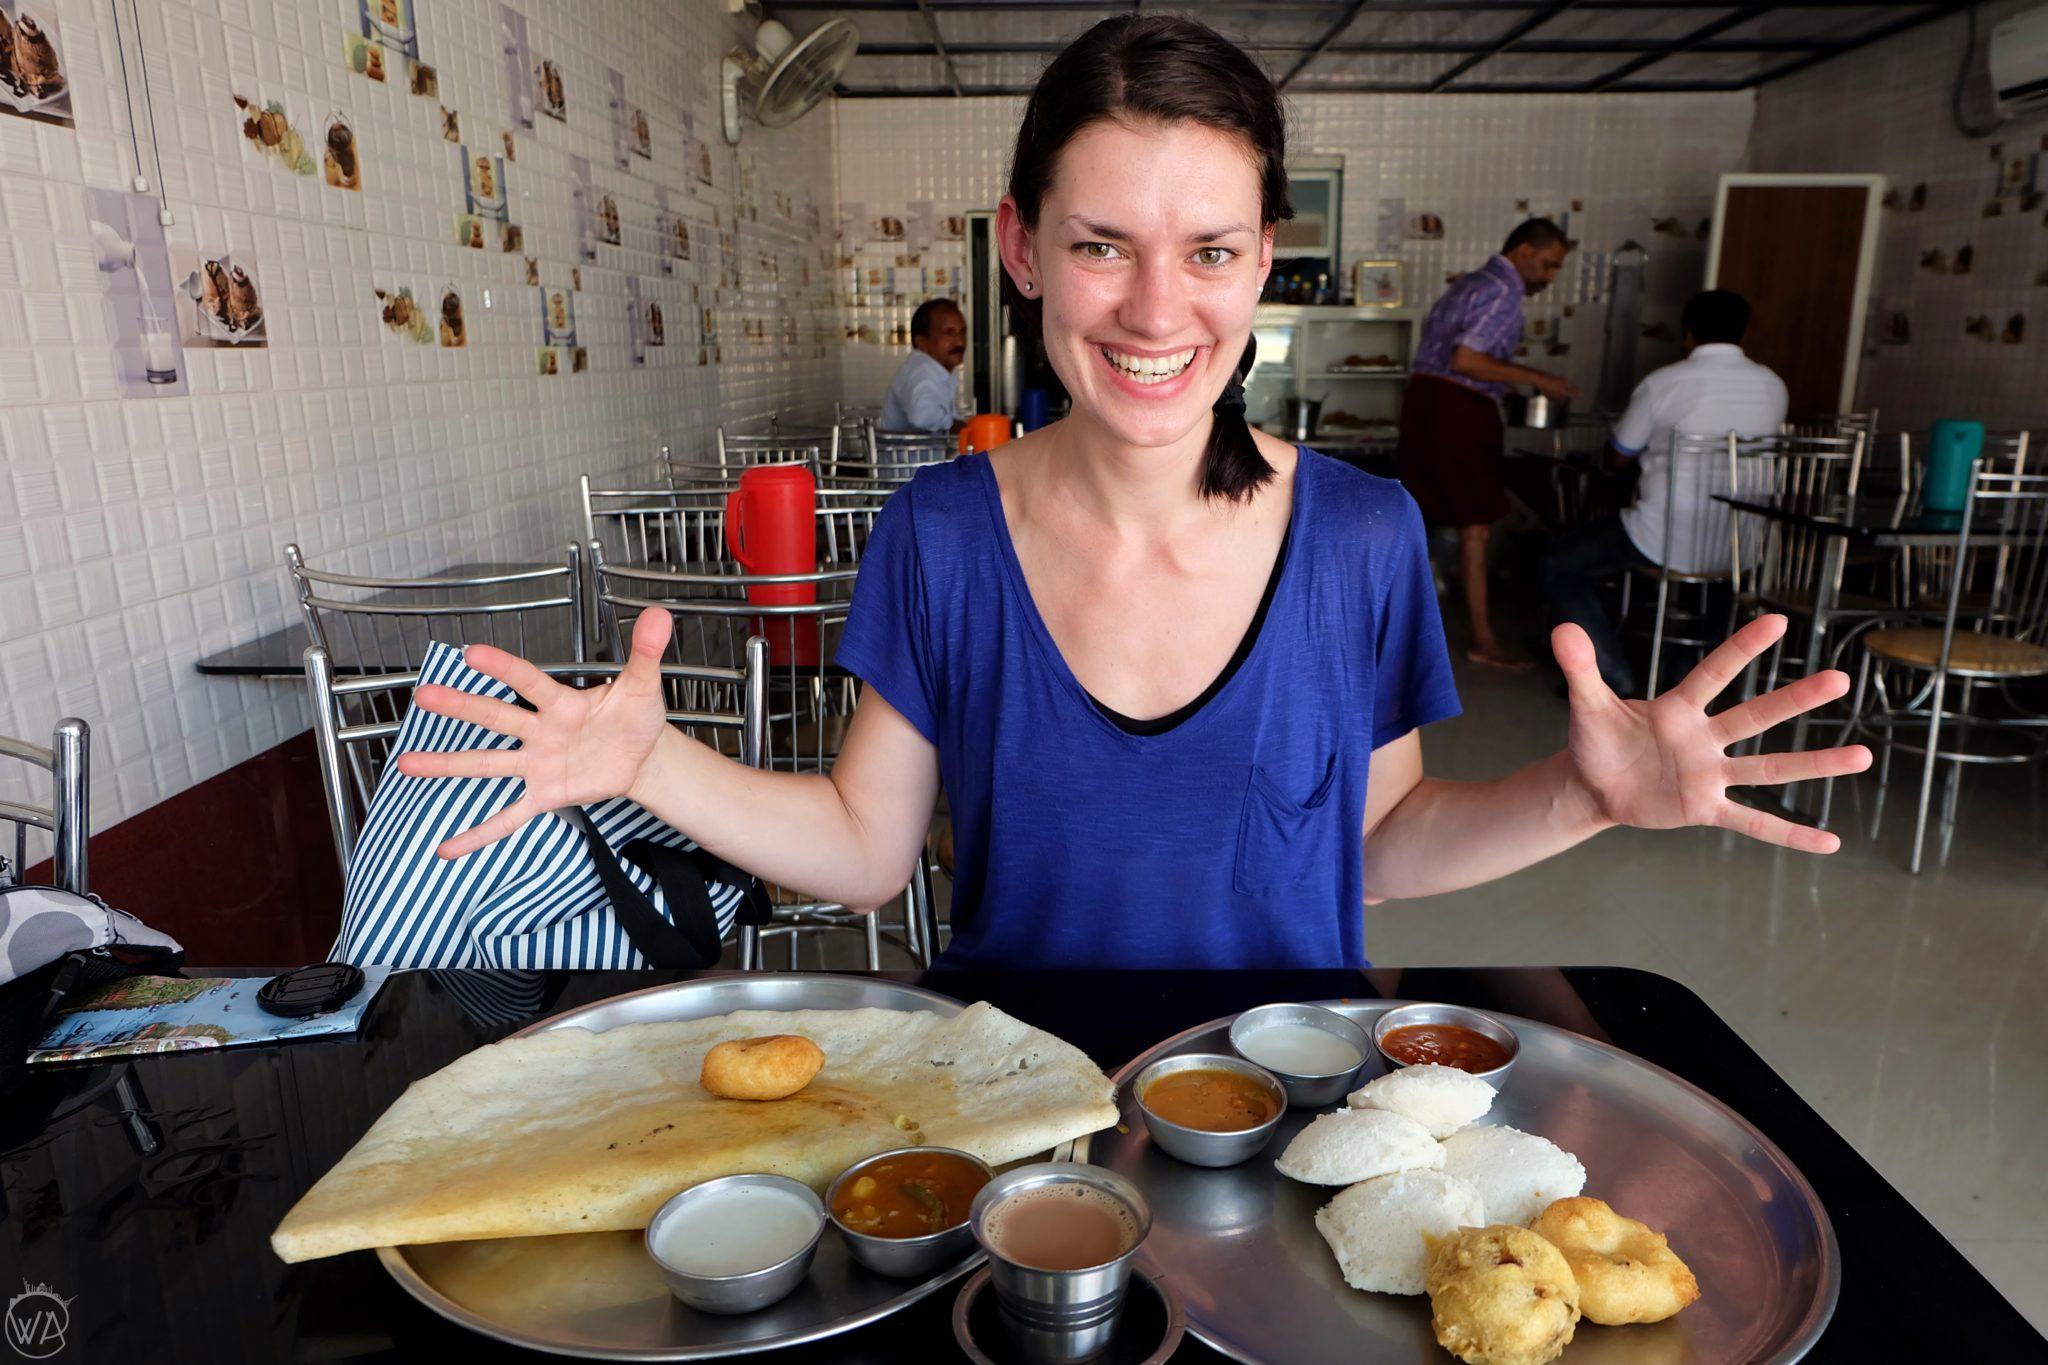 masala dosa in India